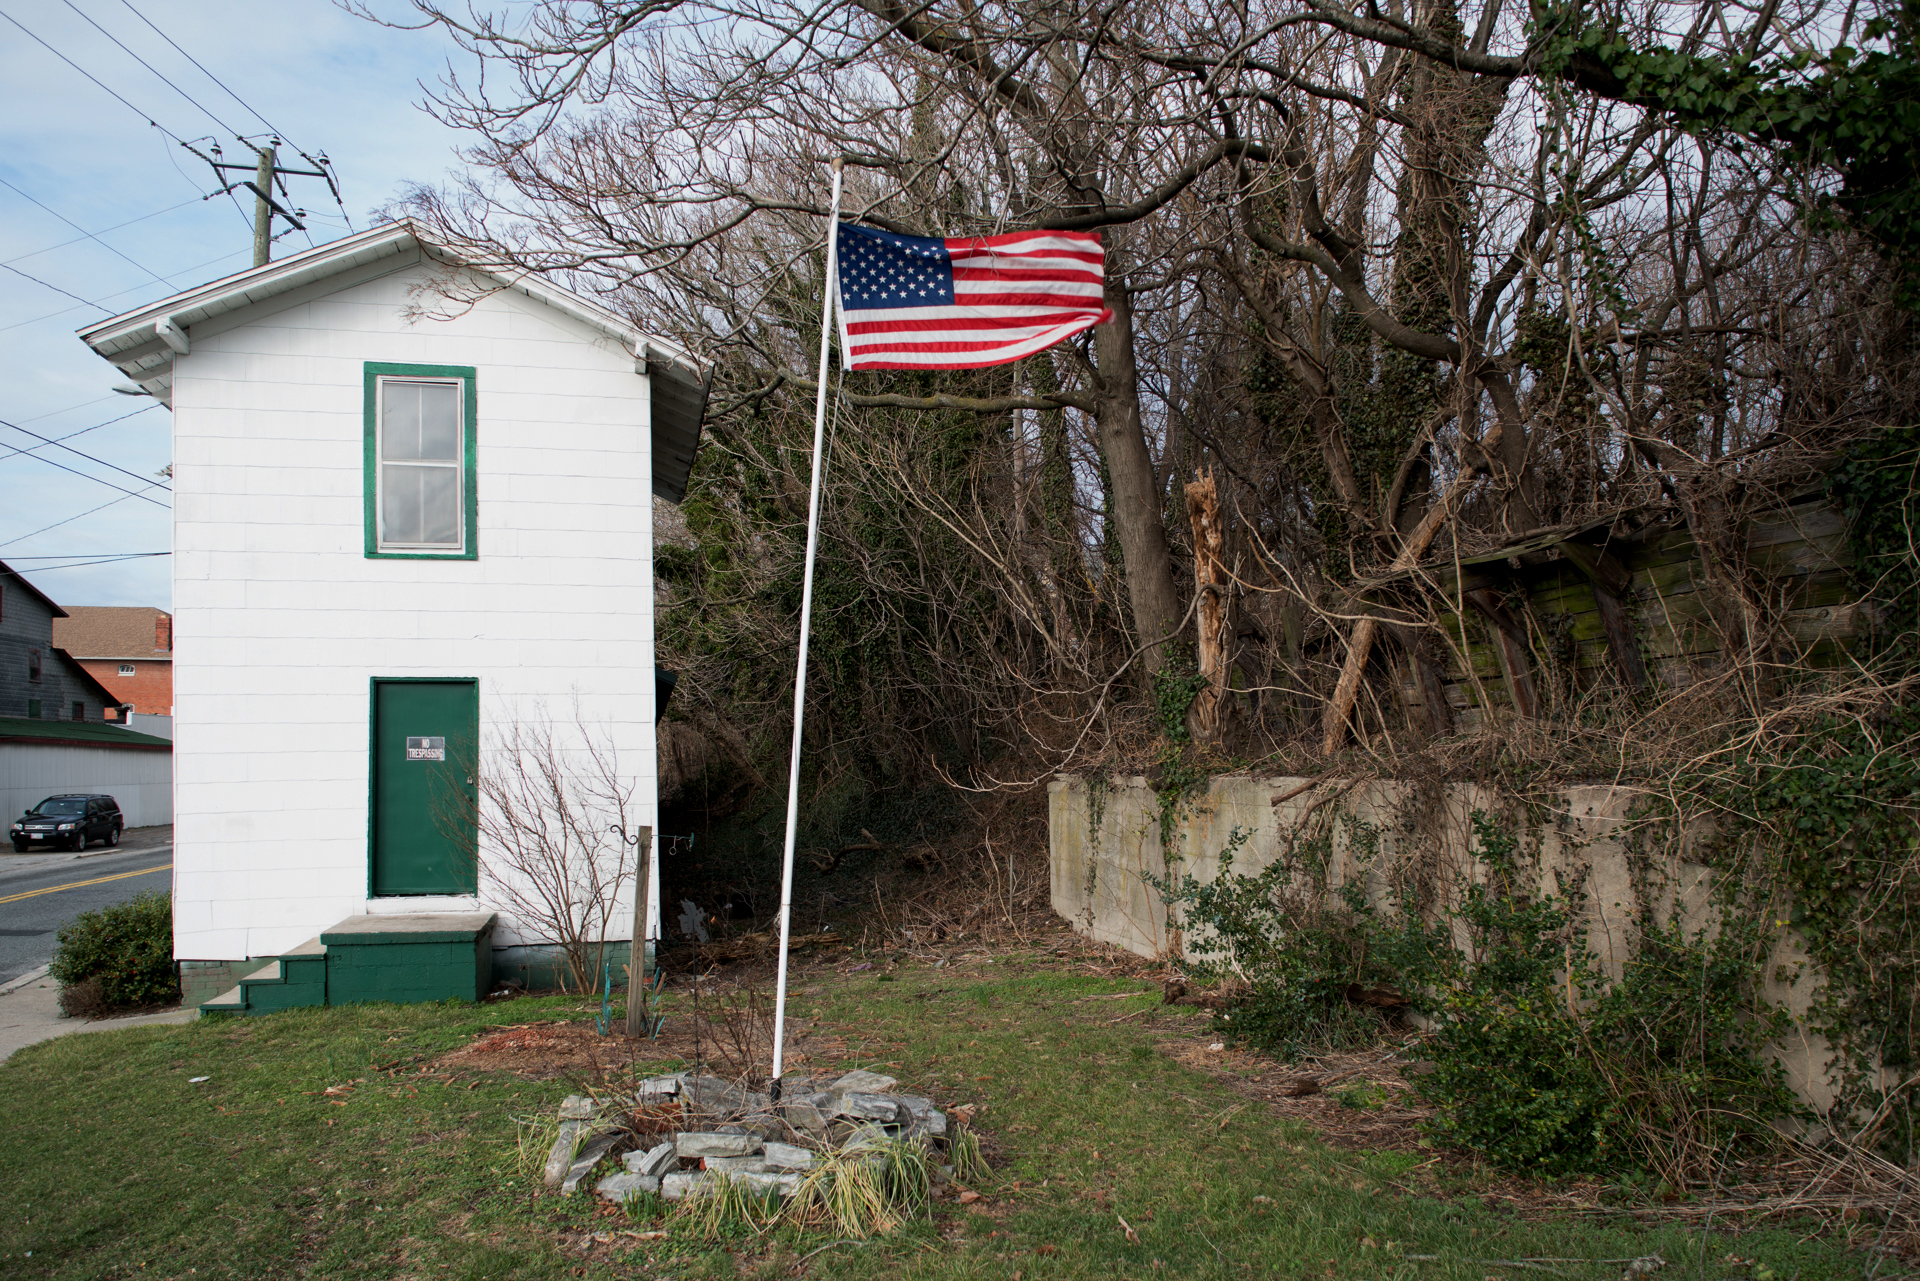 Salisbury, Maryland, 25 miles from Chesapeake Bay